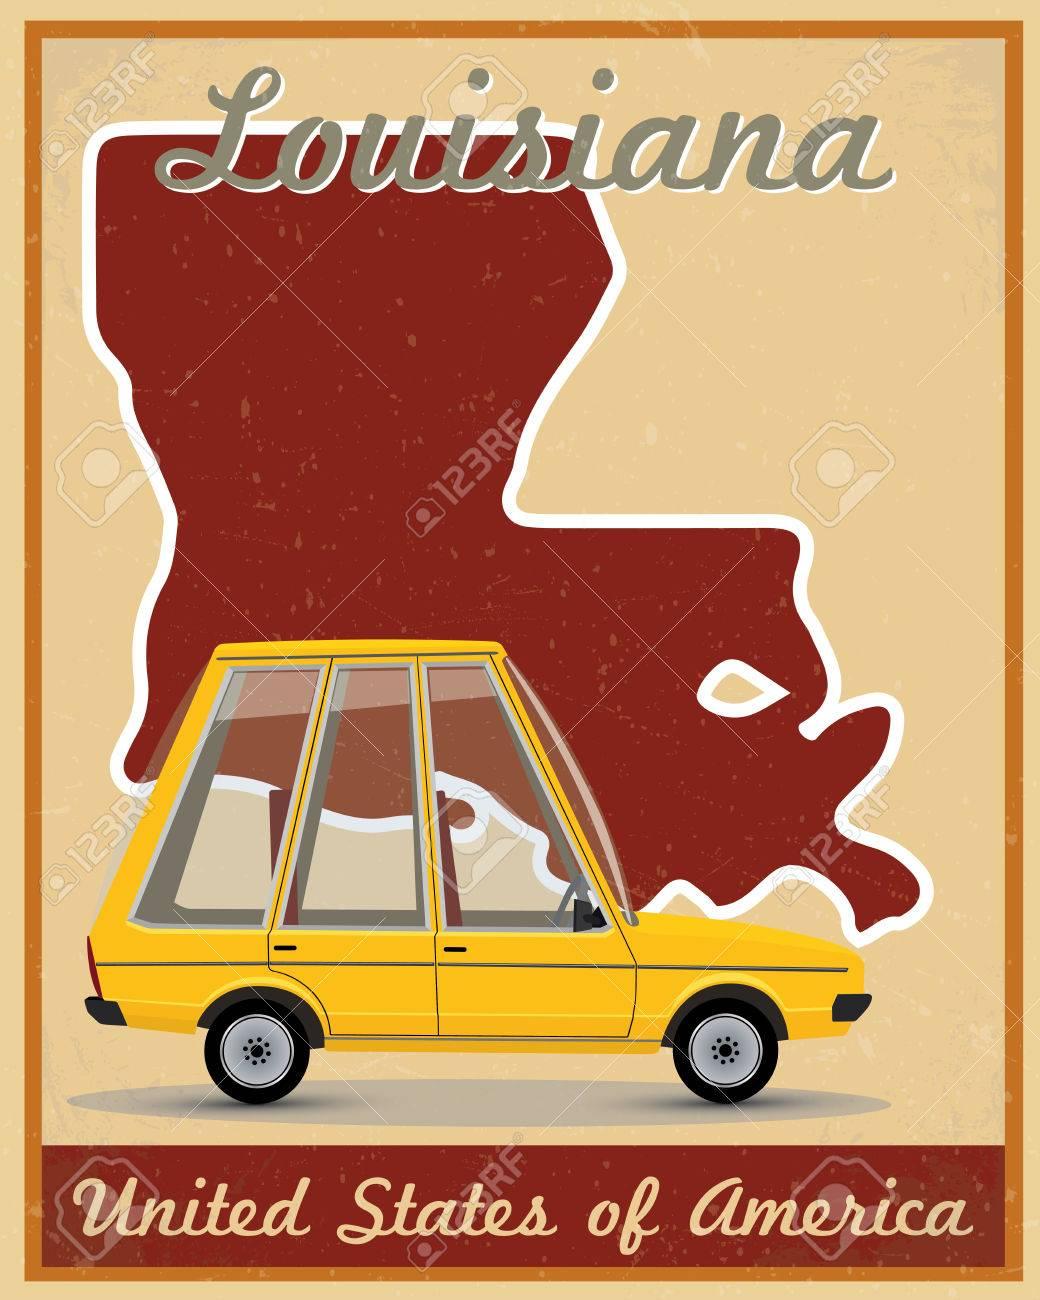 Louisiana road trip vintage poster.